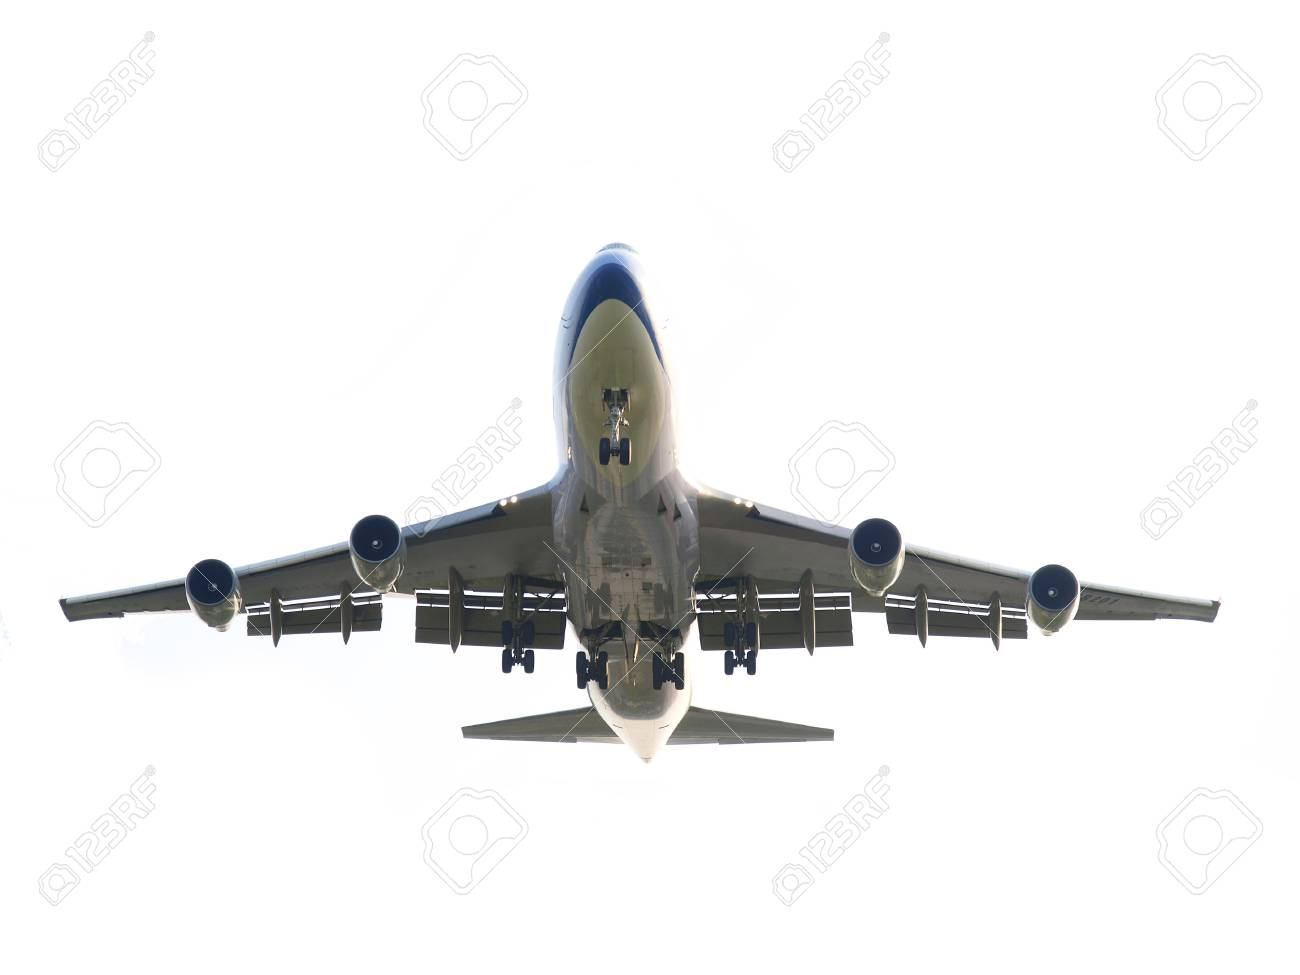 Isolated airplane Stock Photo - 9521262